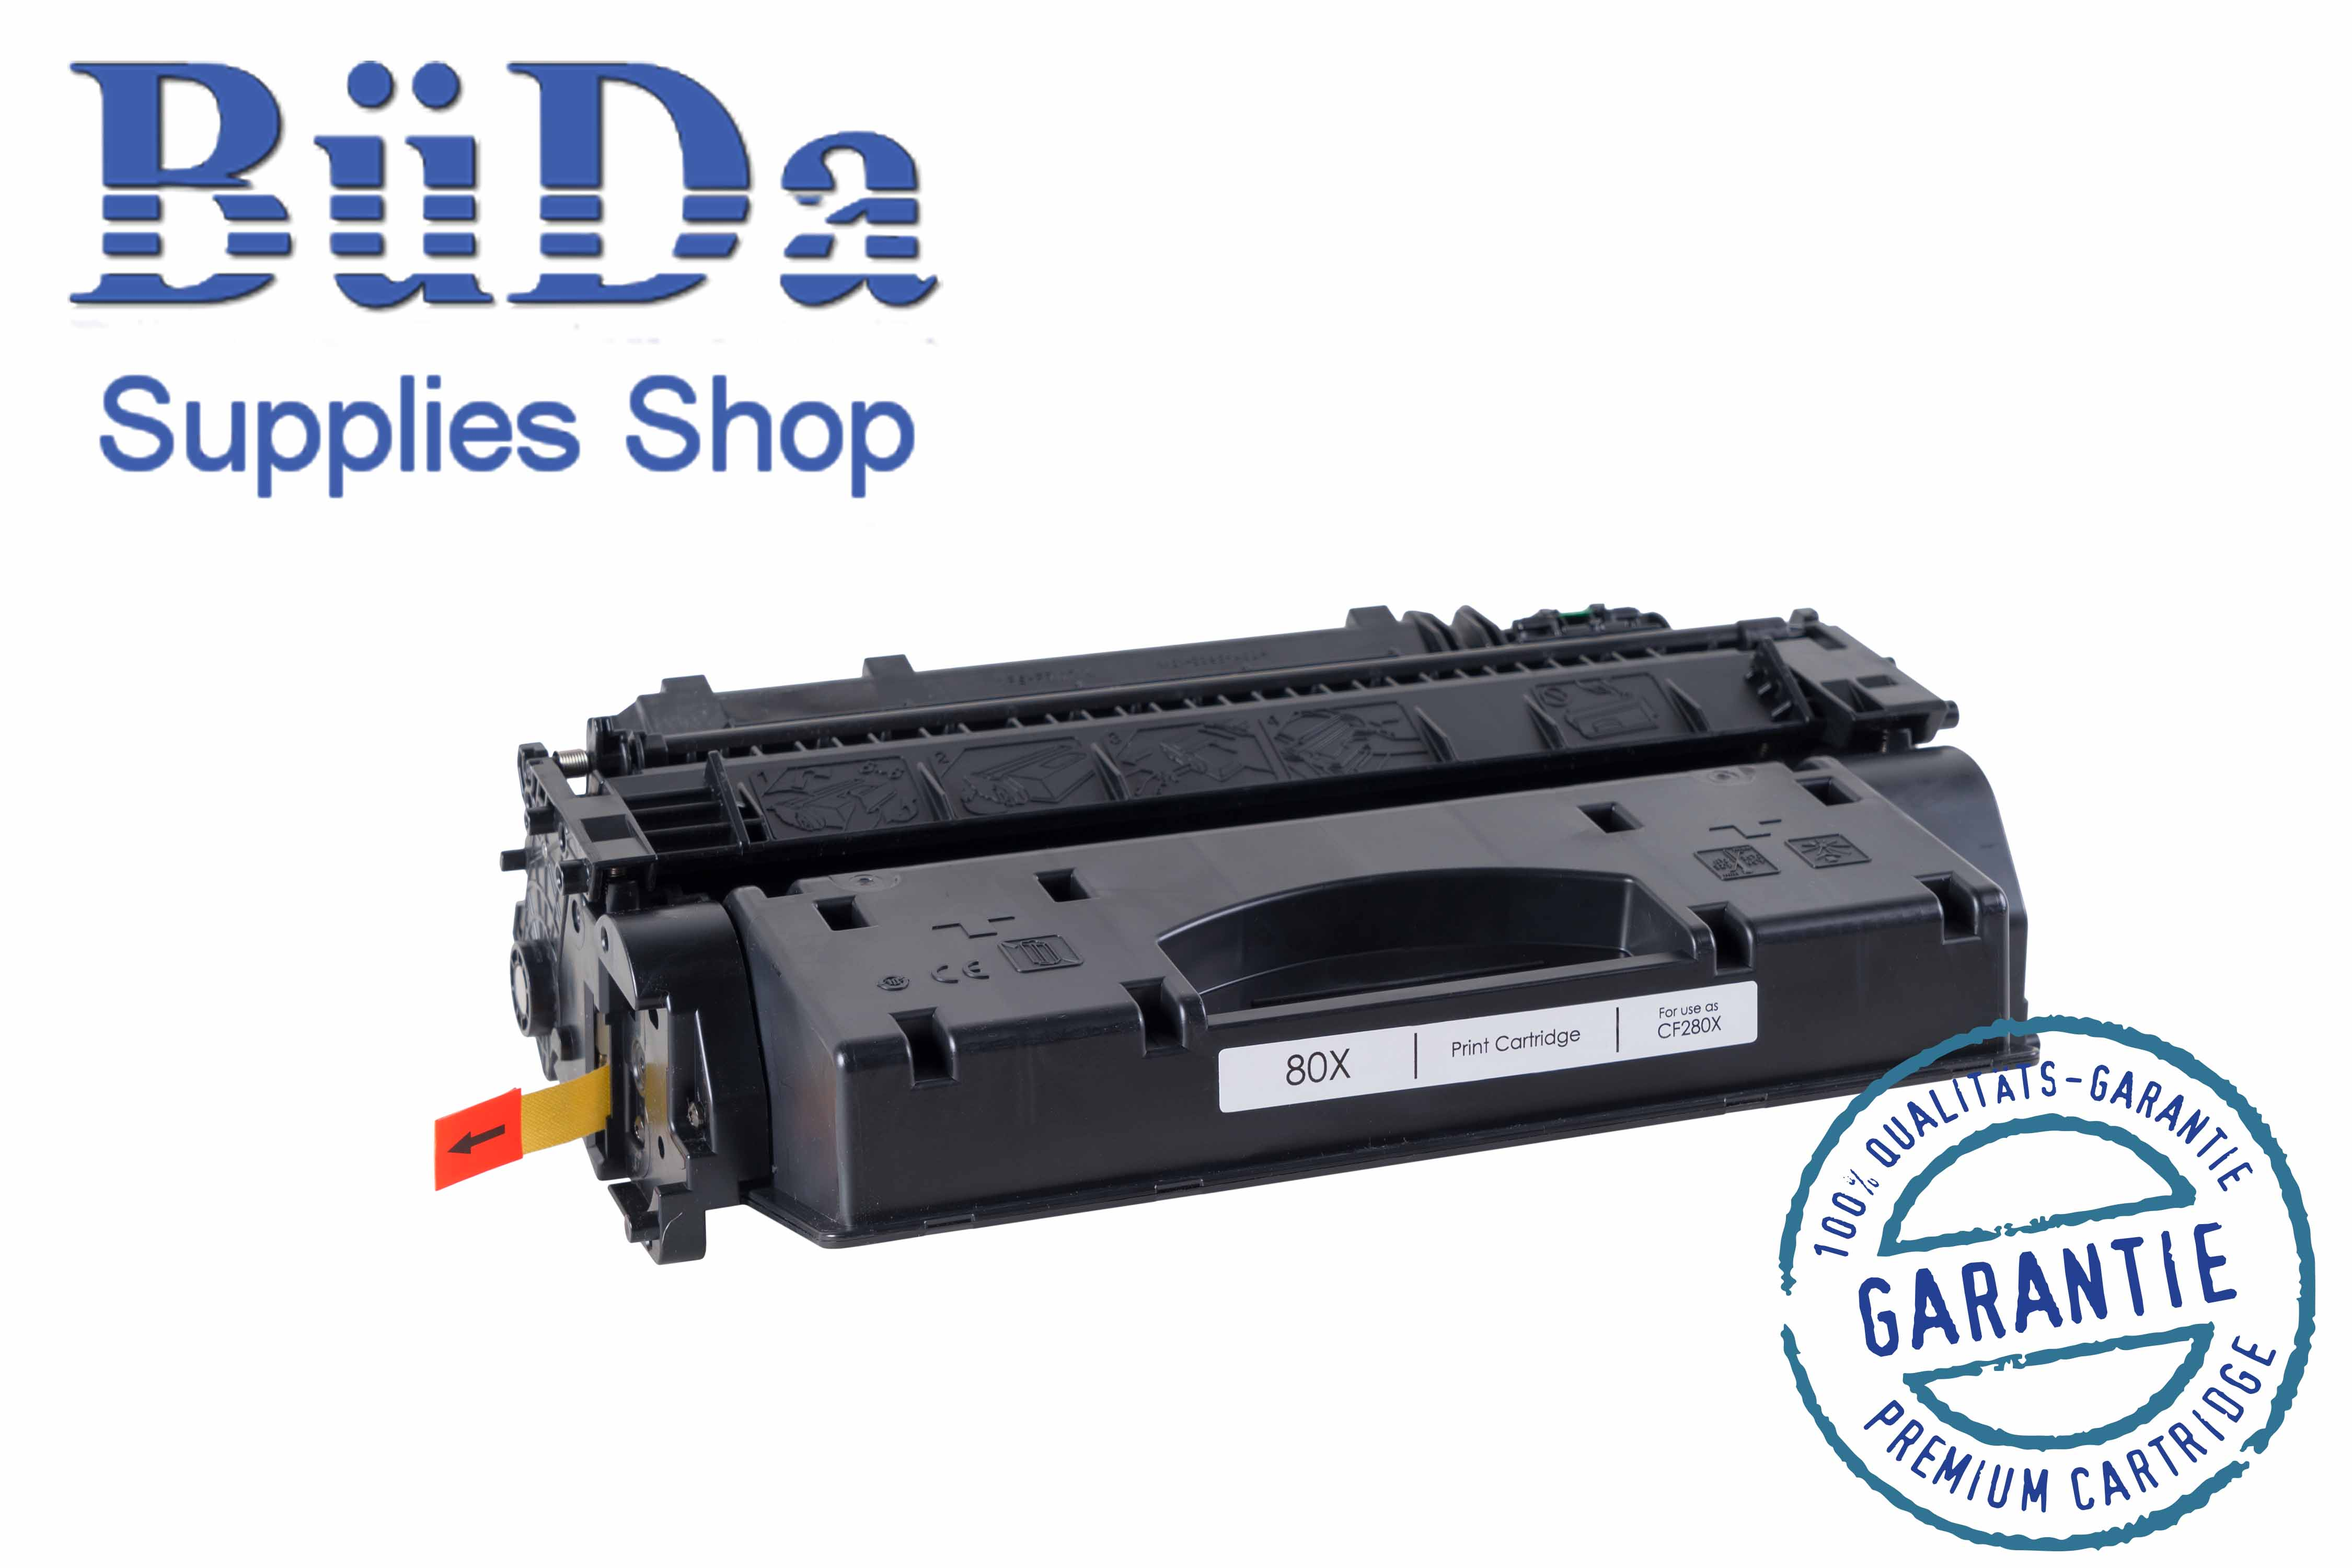 Toner-Modul komp. zu CF280X black 6900 Seiten